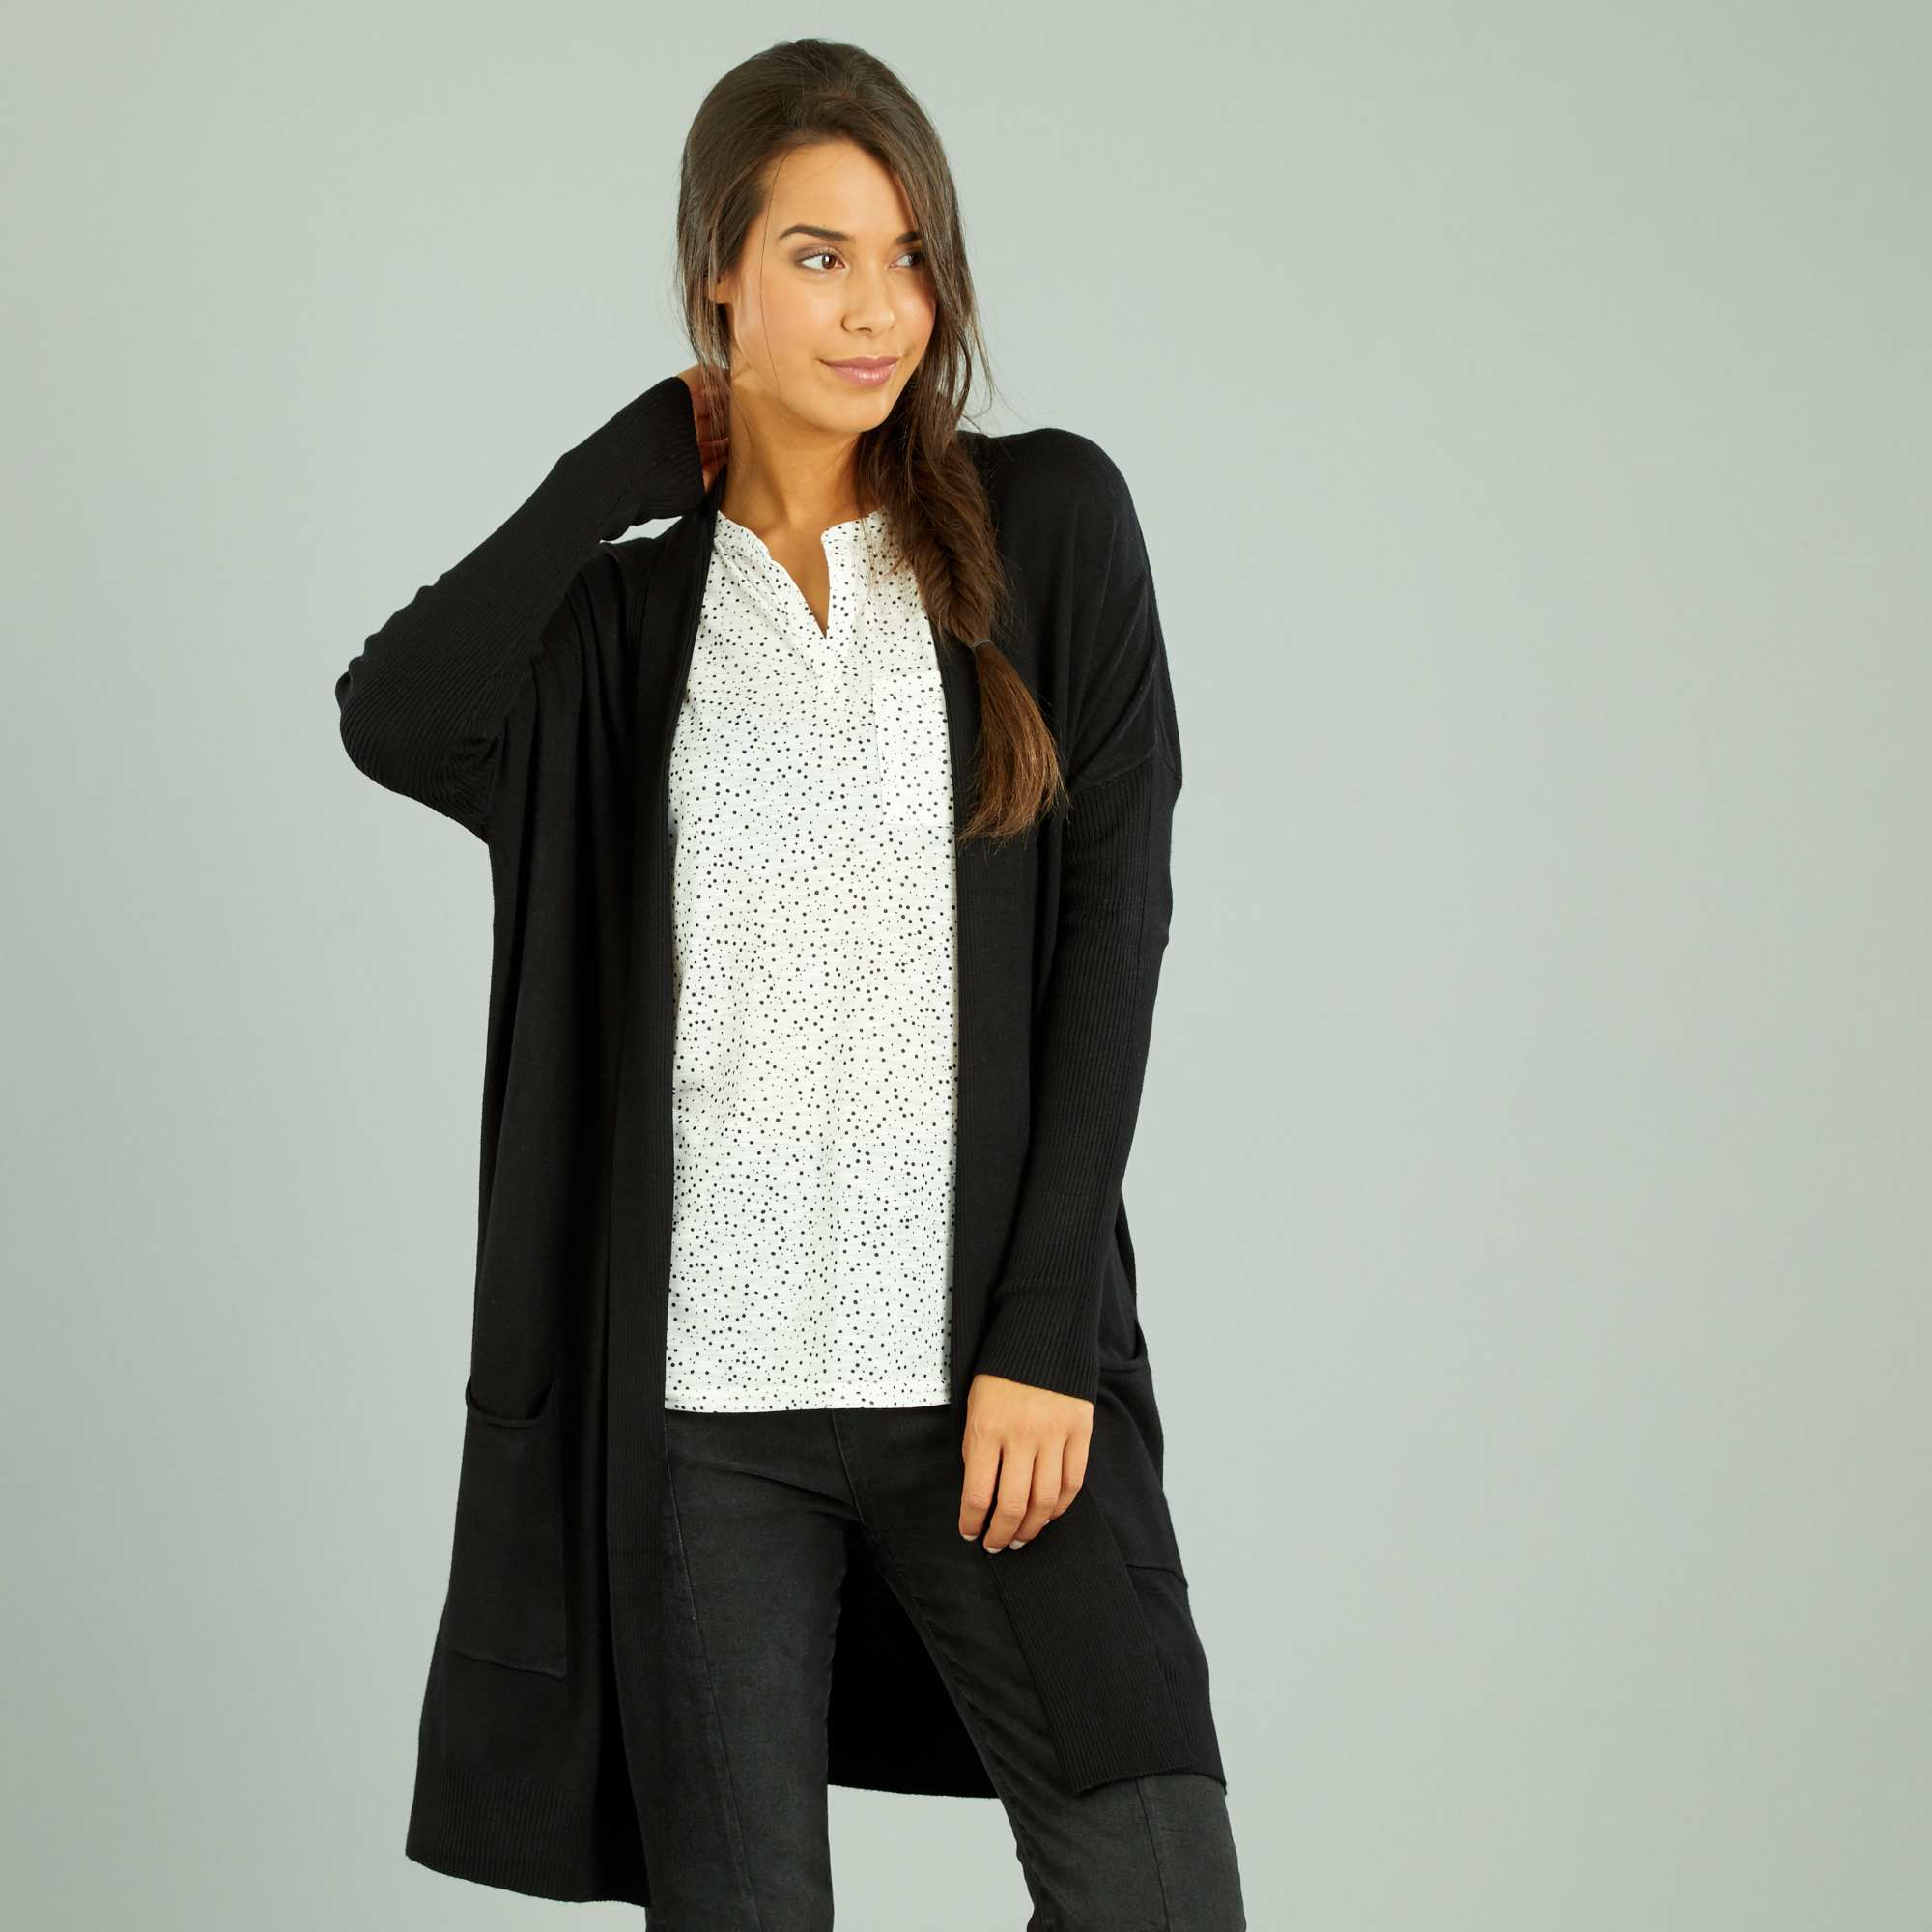 6bfdd1b30791 Gilet long noir femme cardigan blanc